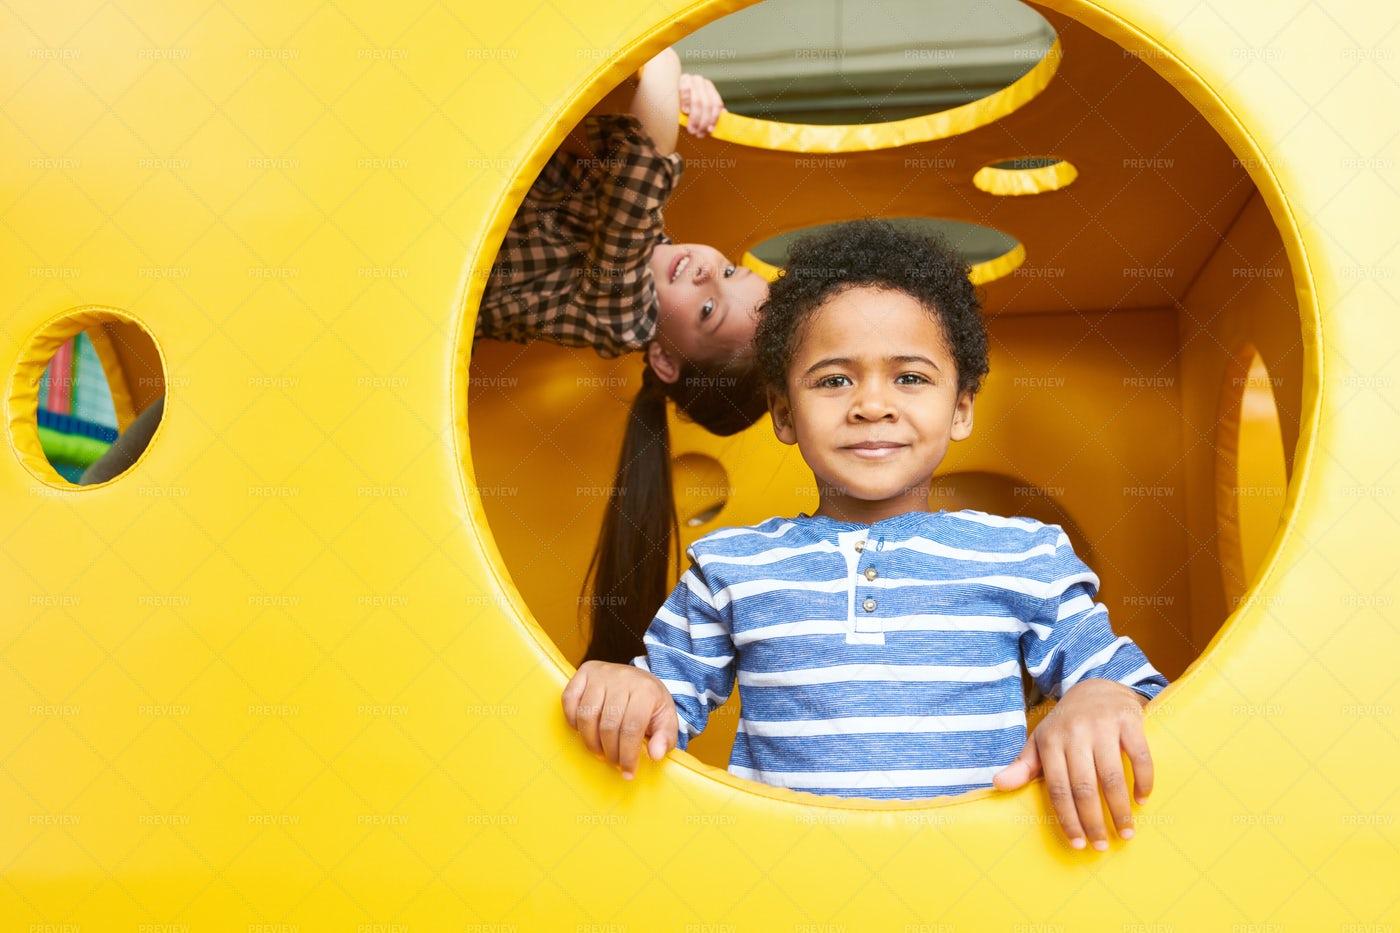 African-American Boy In Play Center: Stock Photos